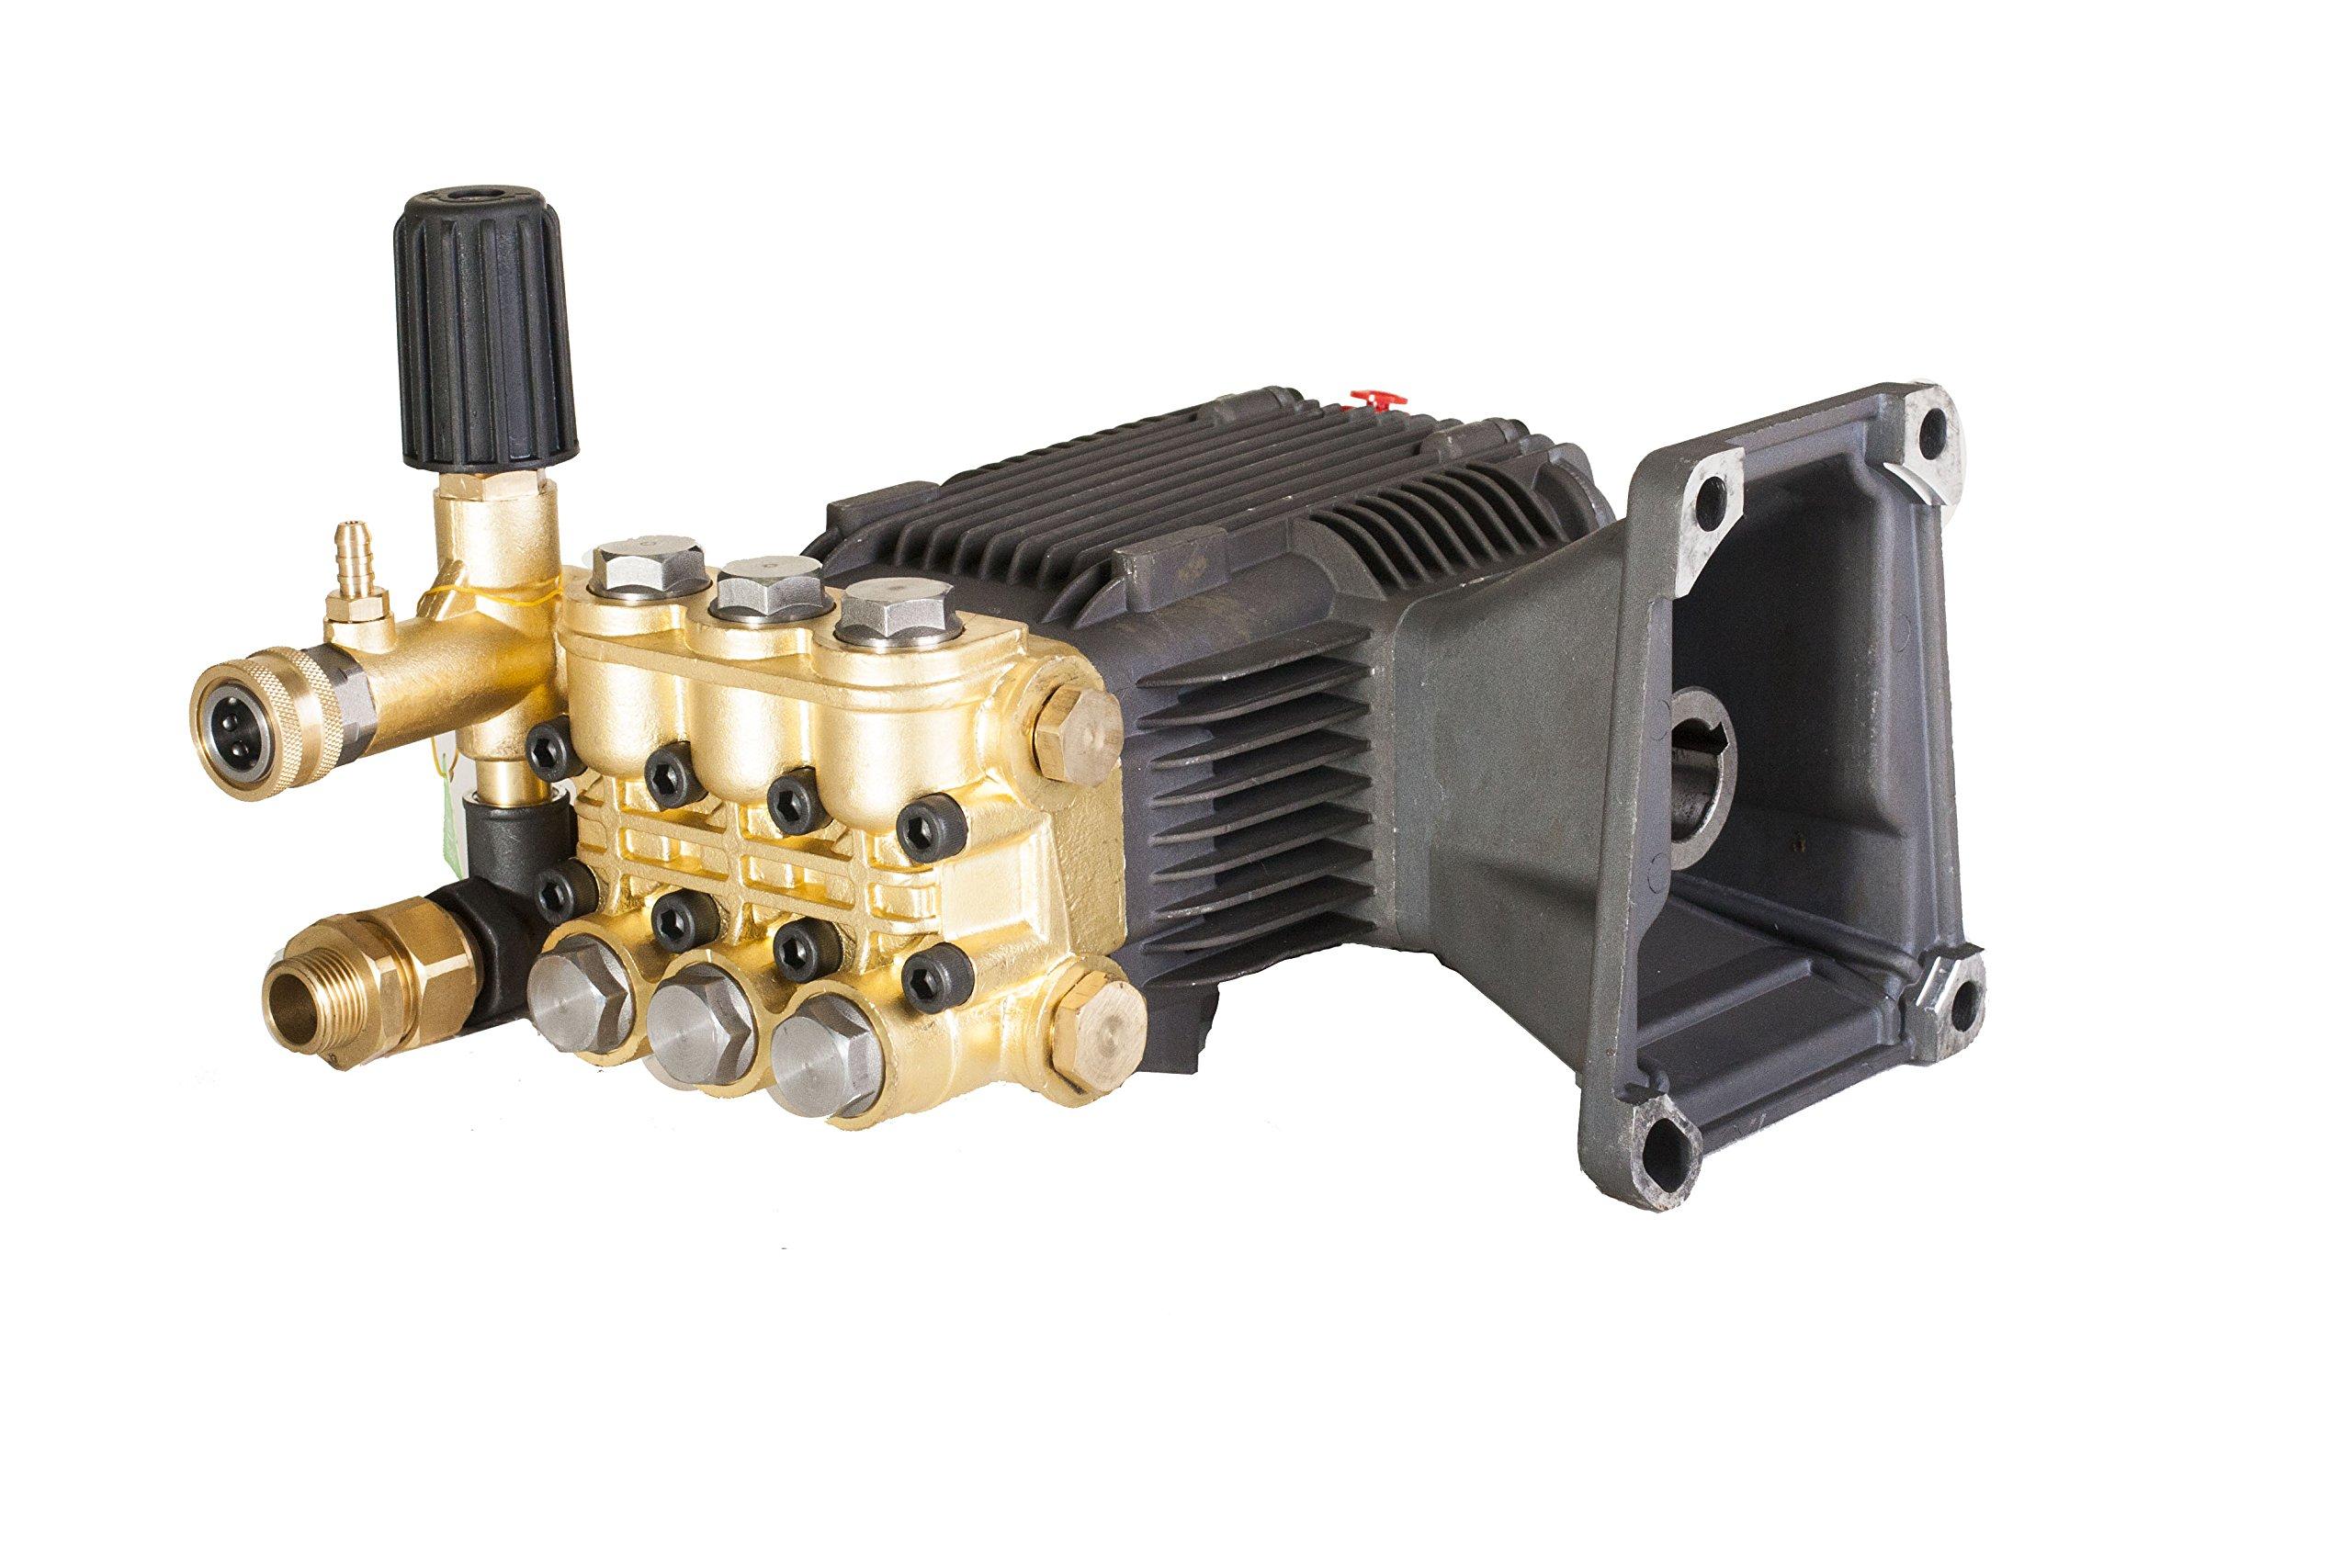 CANPUMP Pressure Washer Pump 3600psi @ 4.5gpm 13 hp 1'' Shaft Series 18mm Piston fits Cat General AR